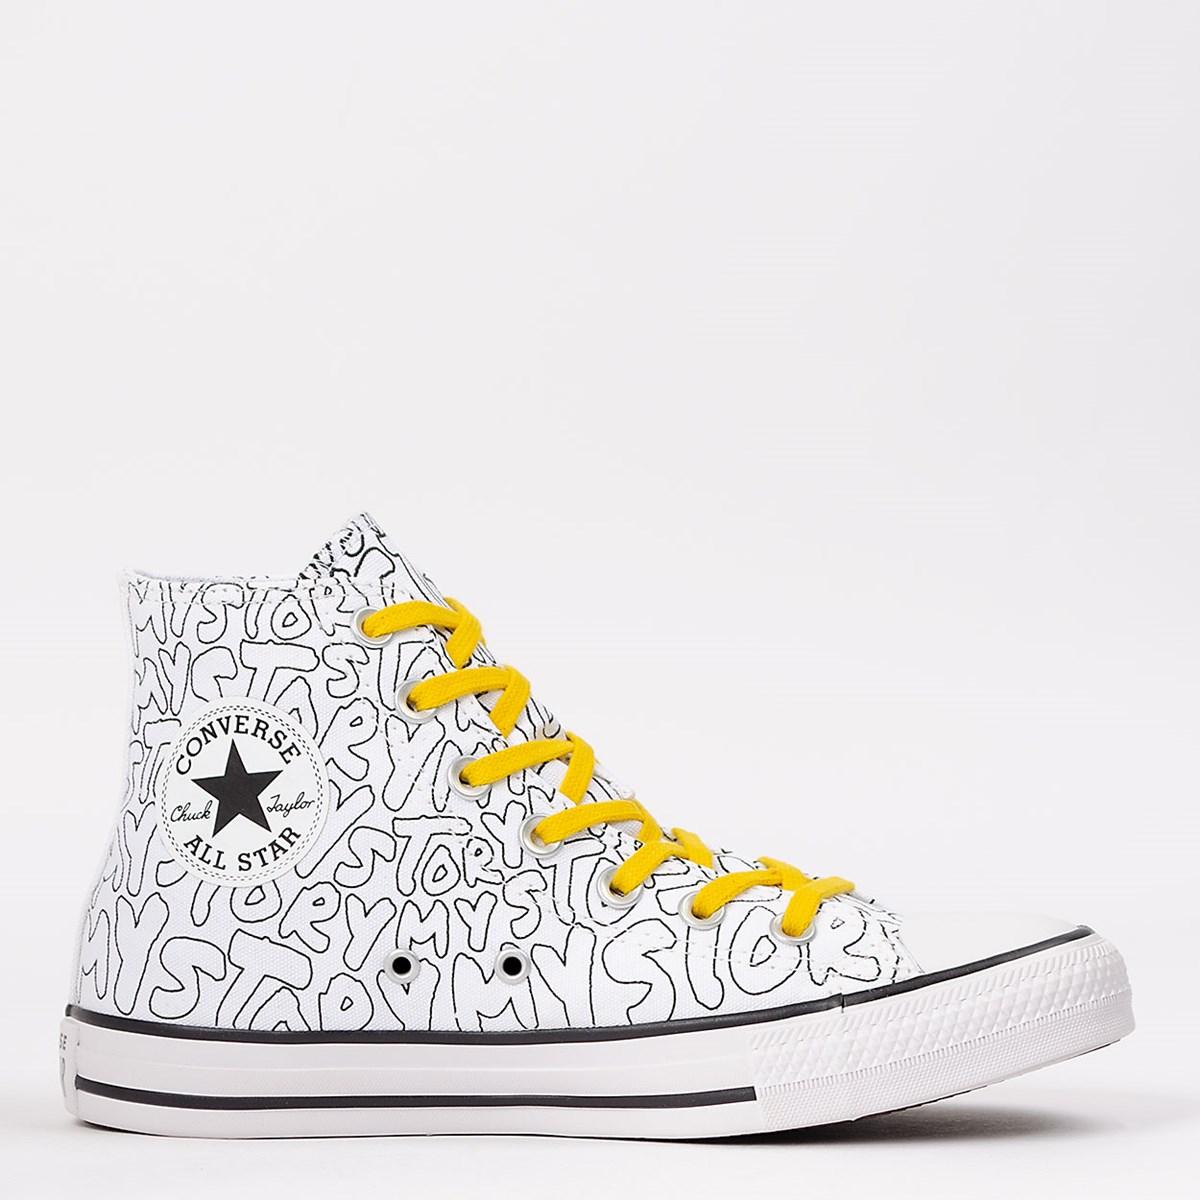 Tênis Converse Chuck Taylor All Star Hi My Story Branco Amarelo CT16270001